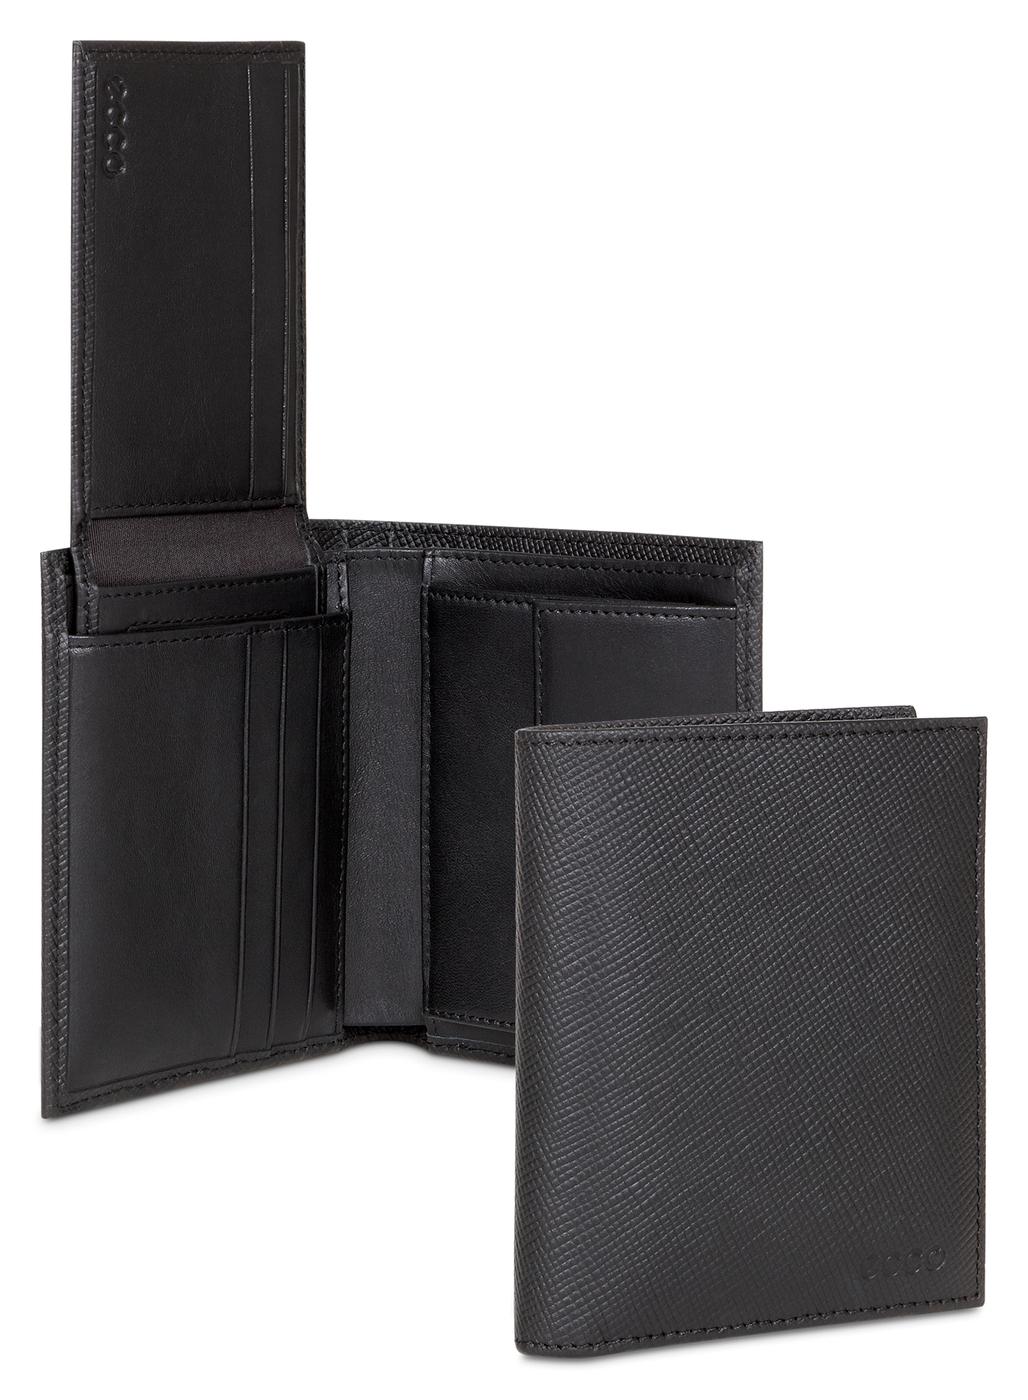 ECCO Glenn Classic Wallet